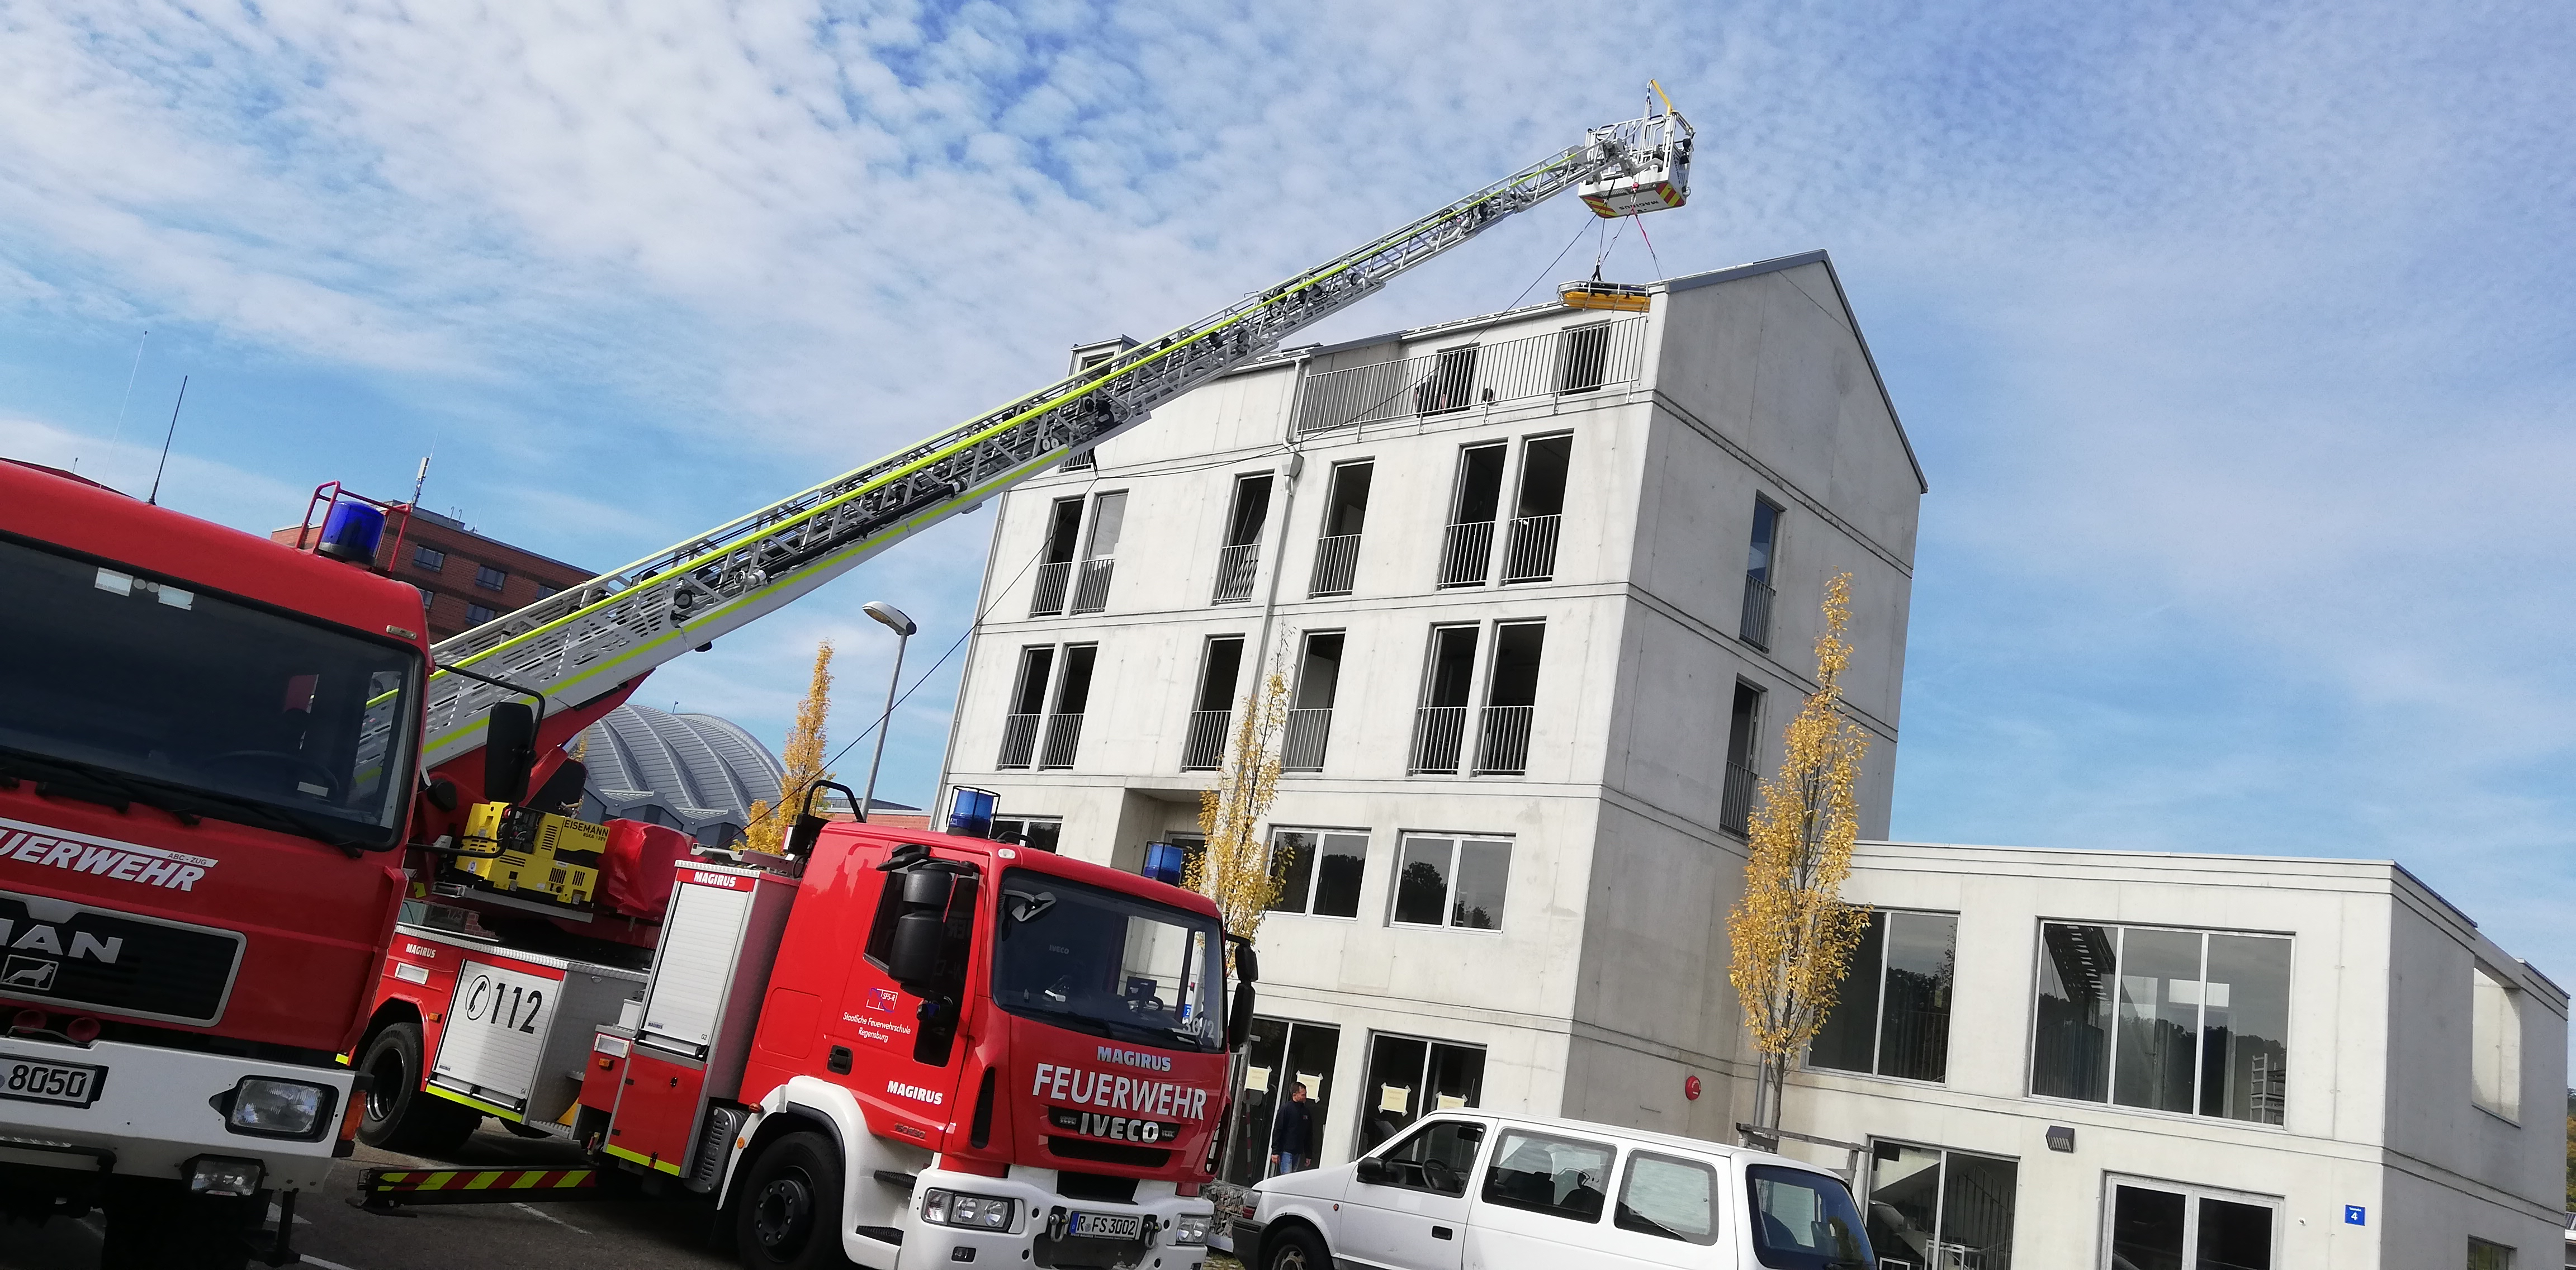 Feuerwehrschule Regensburg - Übungshaus